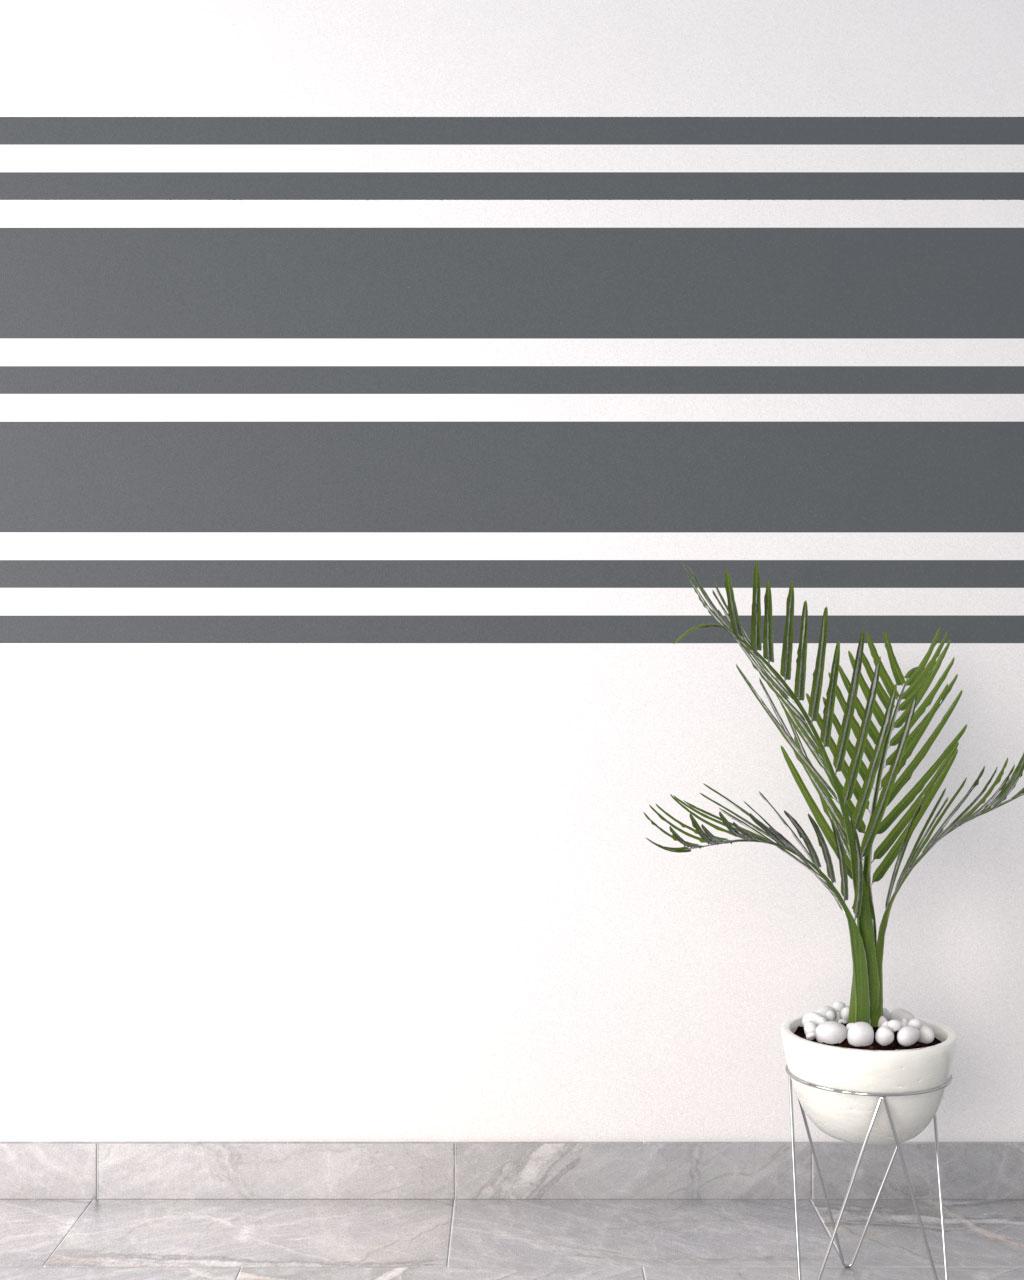 9 Best Horizontal Striped Wall Paint Ideas Roomdsign Com